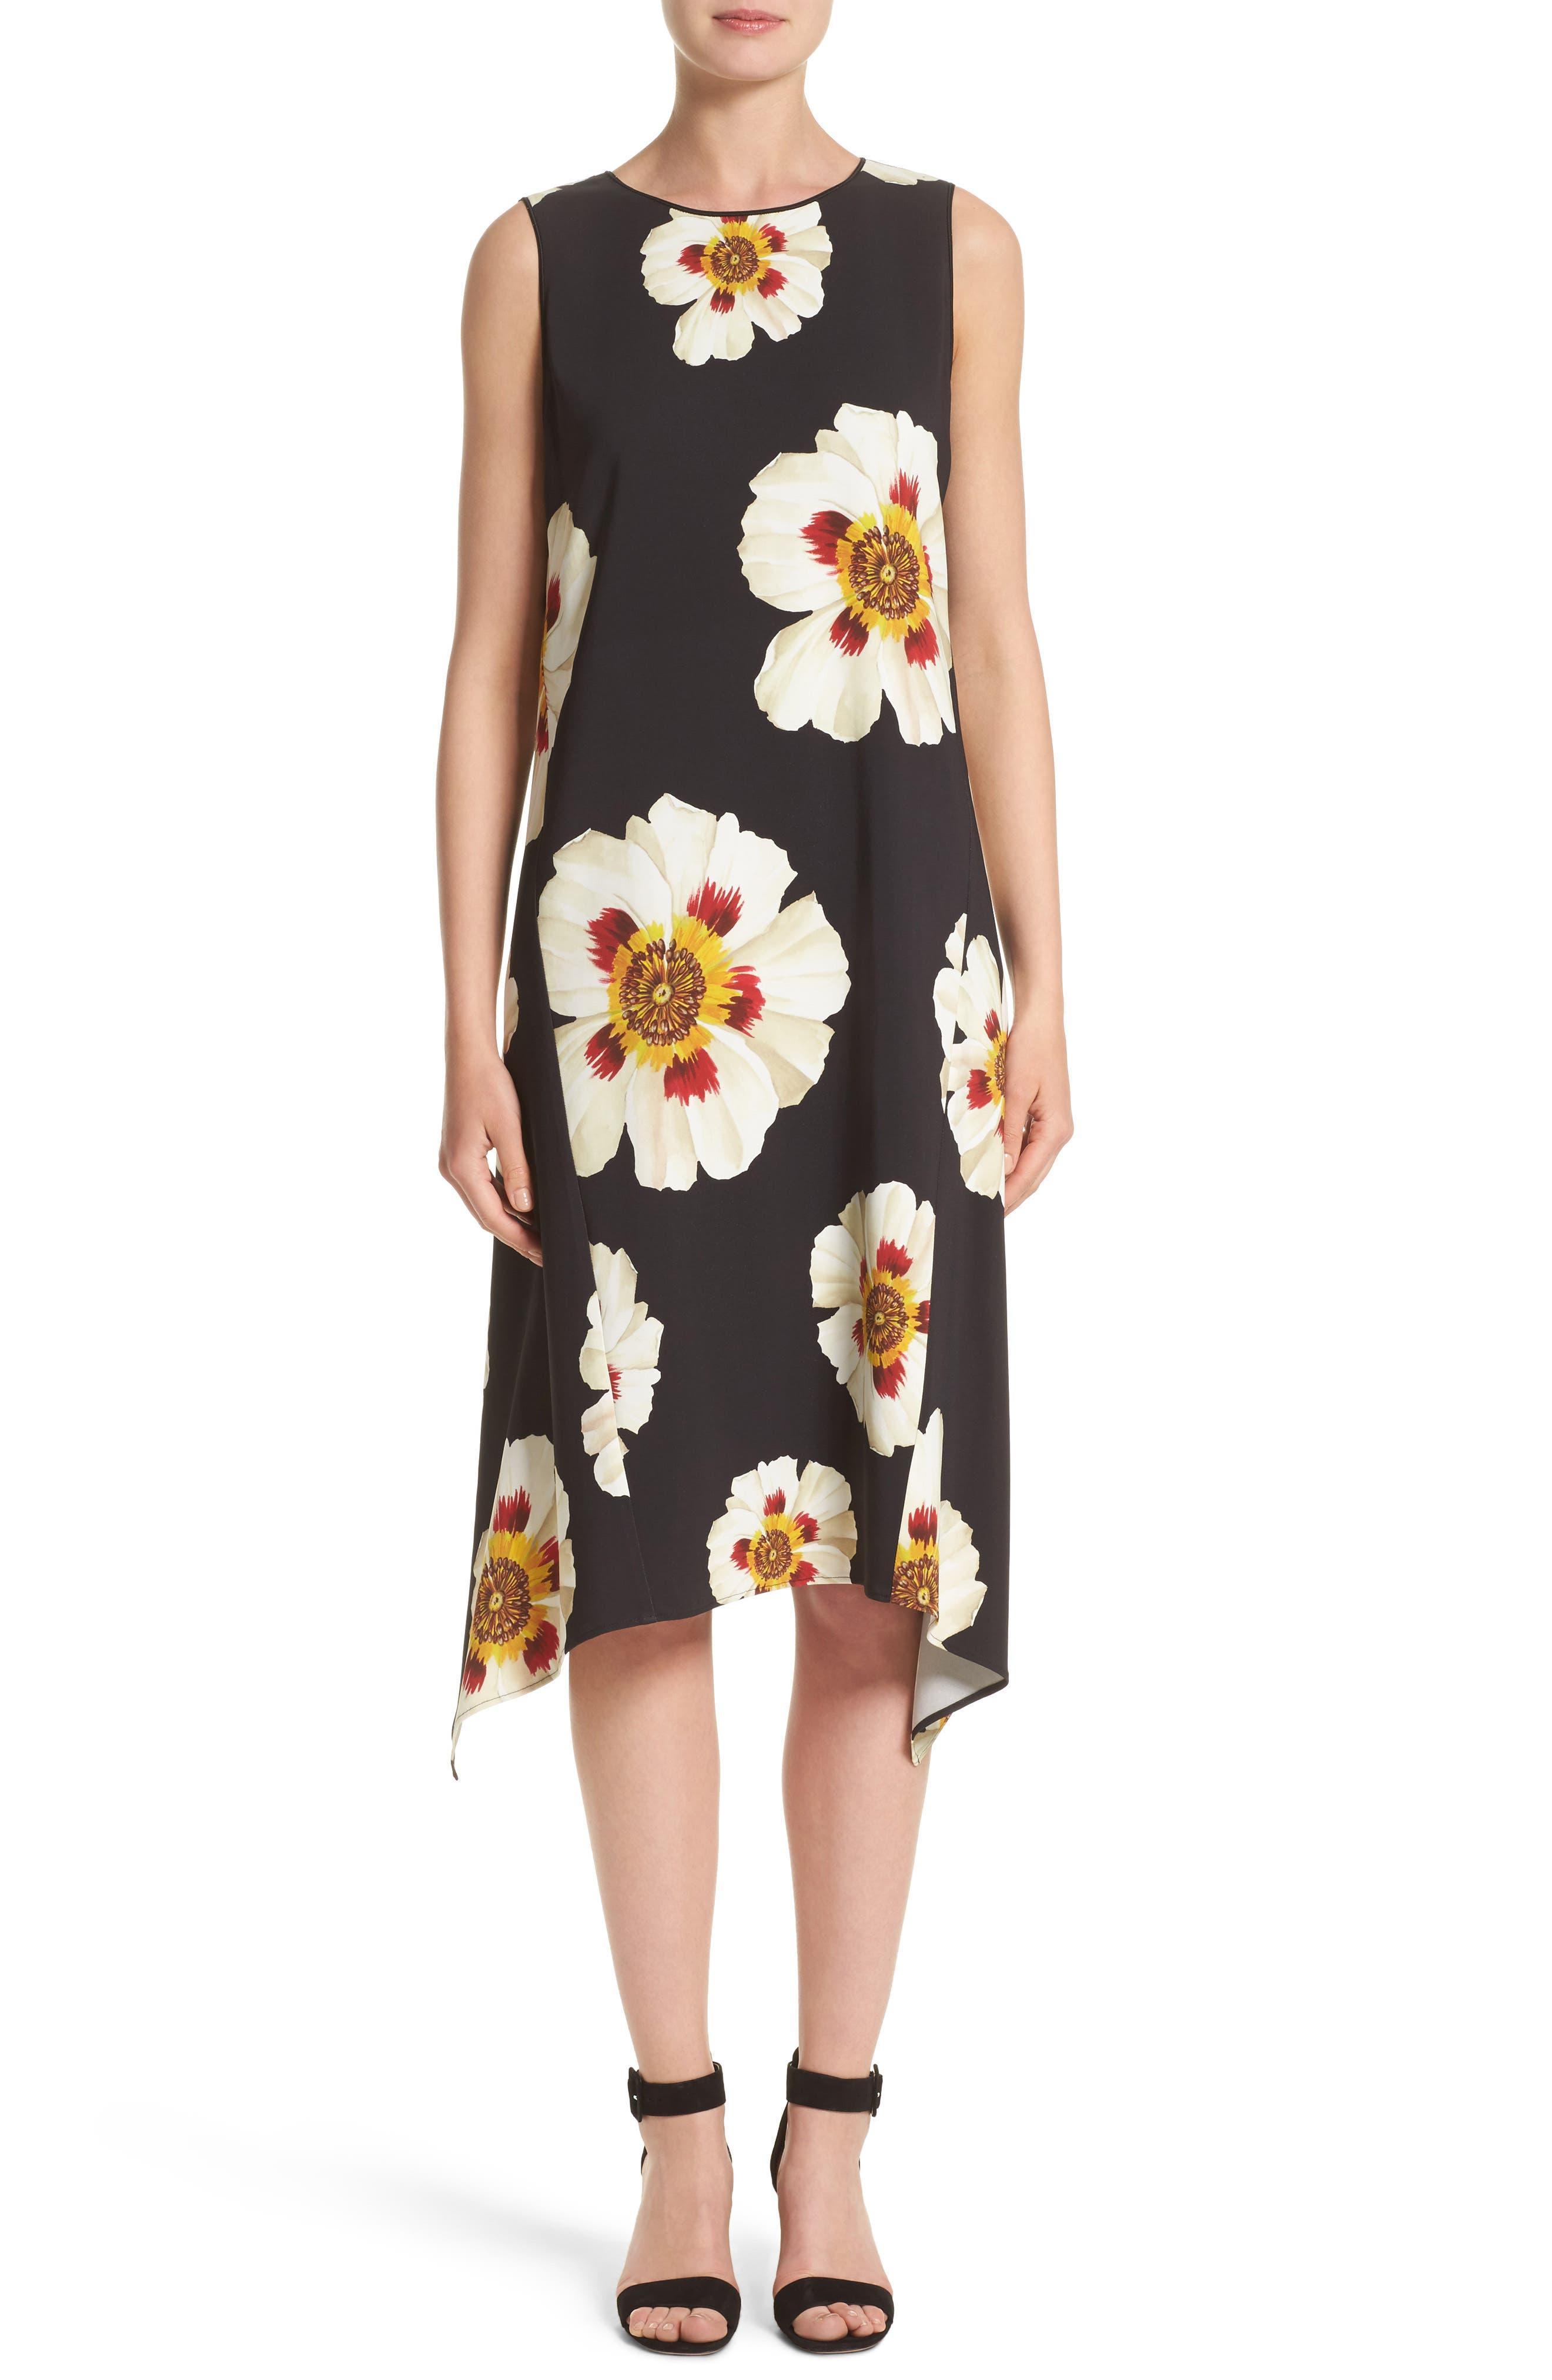 Romona Floral Fluid Cloth Dress,                             Main thumbnail 1, color,                             001